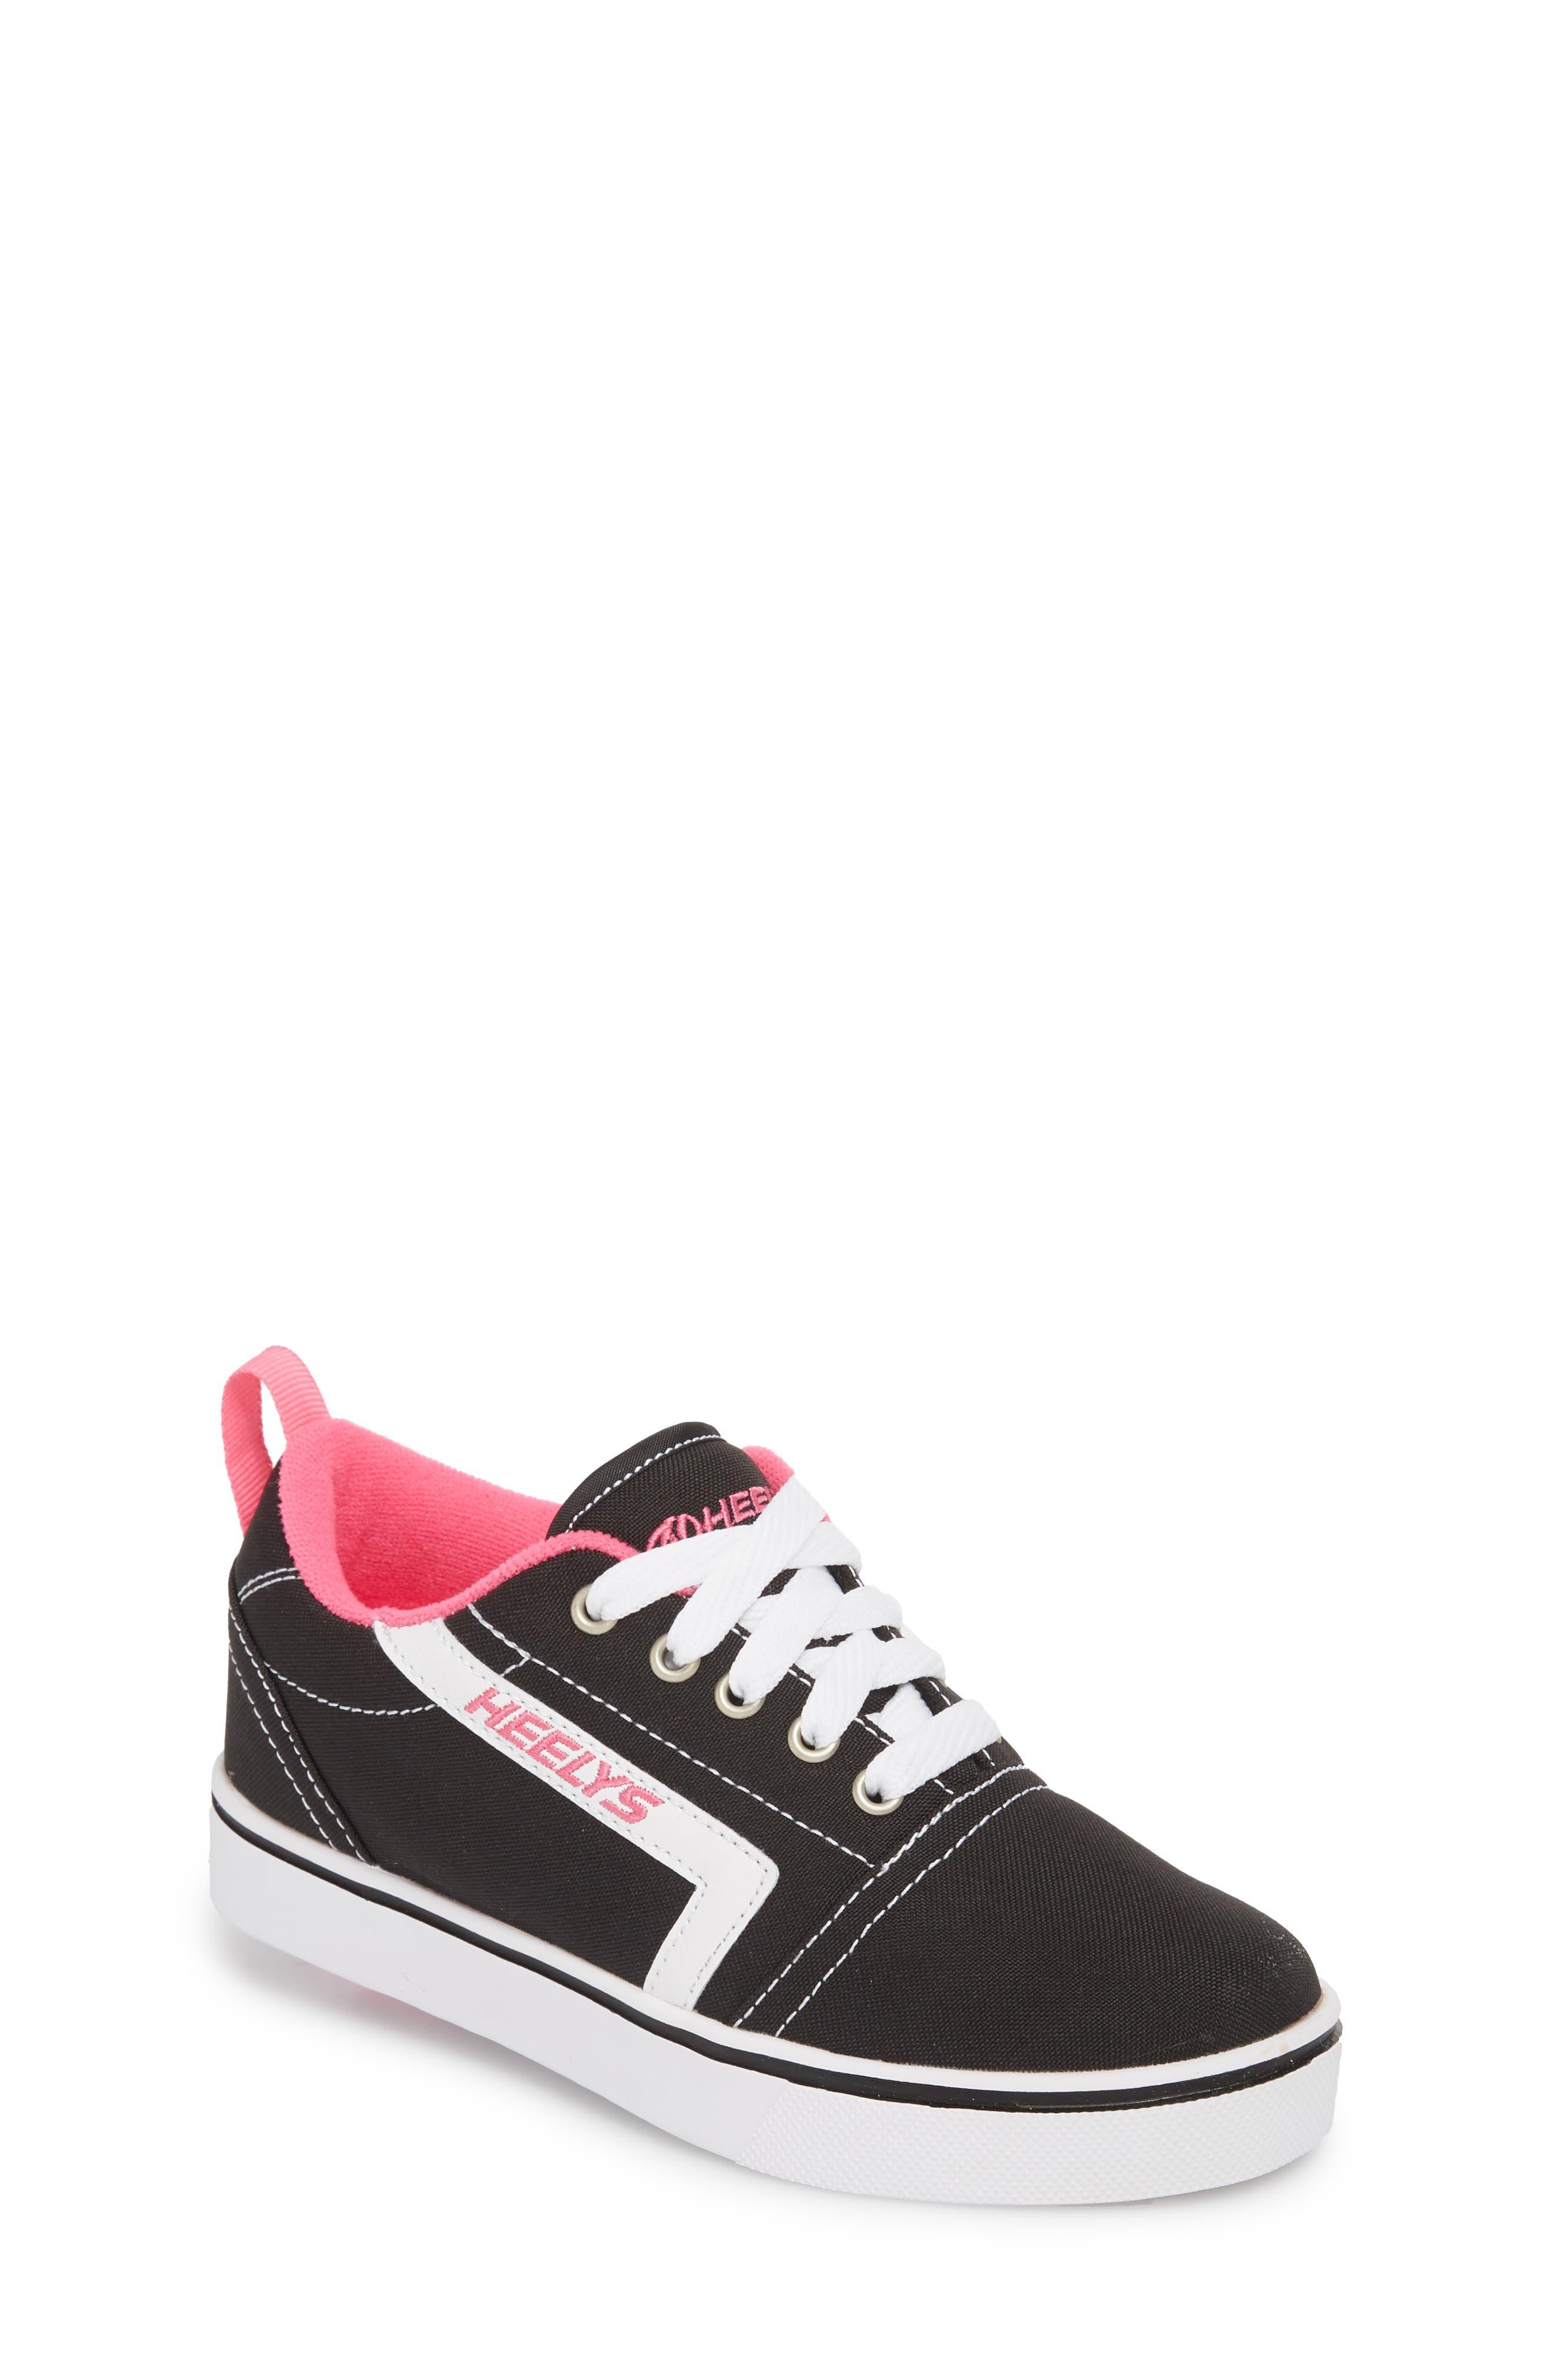 GR8 Pro Wheeled Sneaker,                             Main thumbnail 1, color,                             Black/ White/ Hot Pink